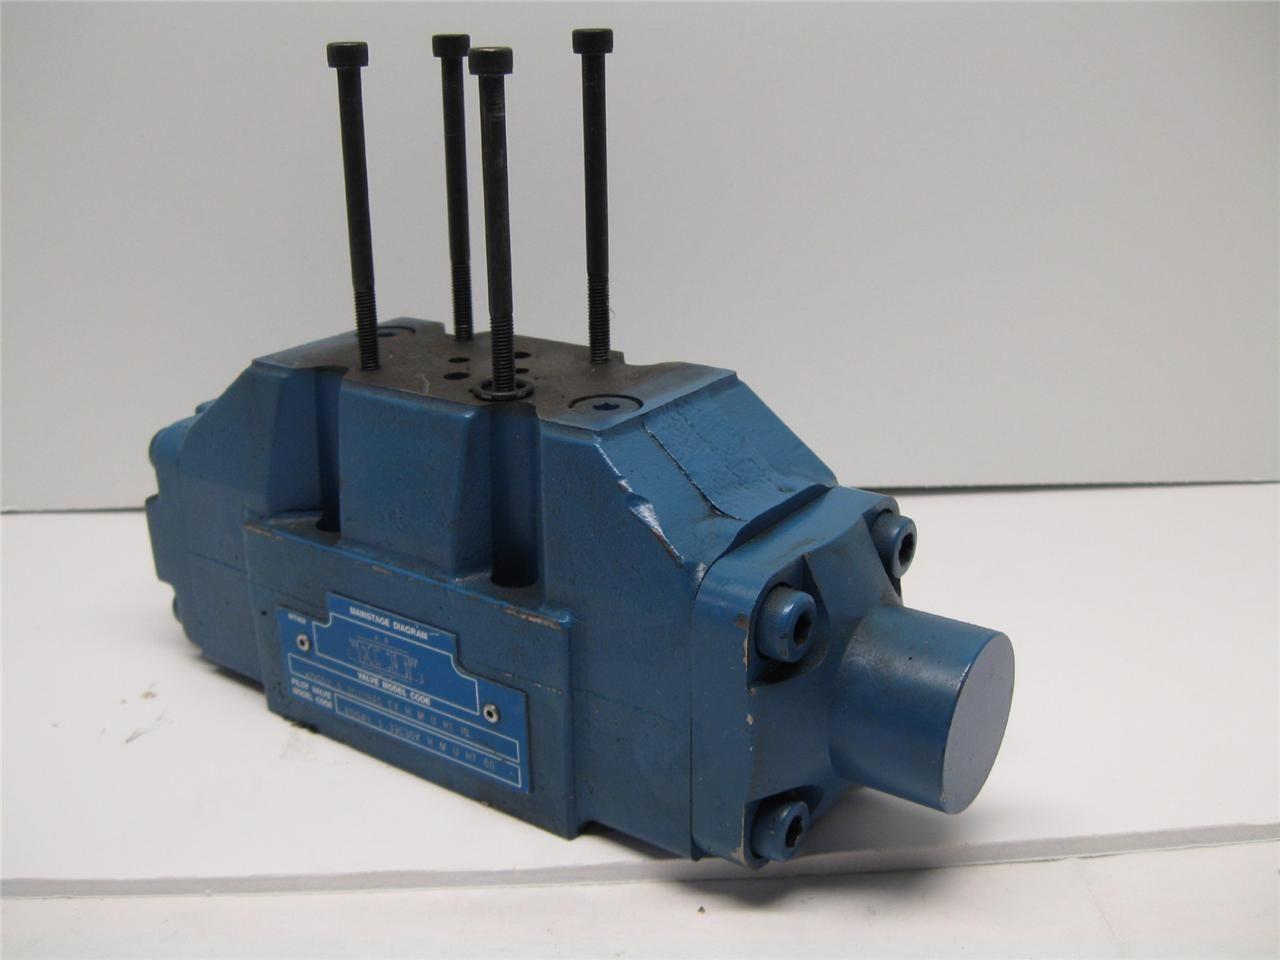 Vickers KDG5V2C70N45 EX H M U H1 10 Hydraulic Valve